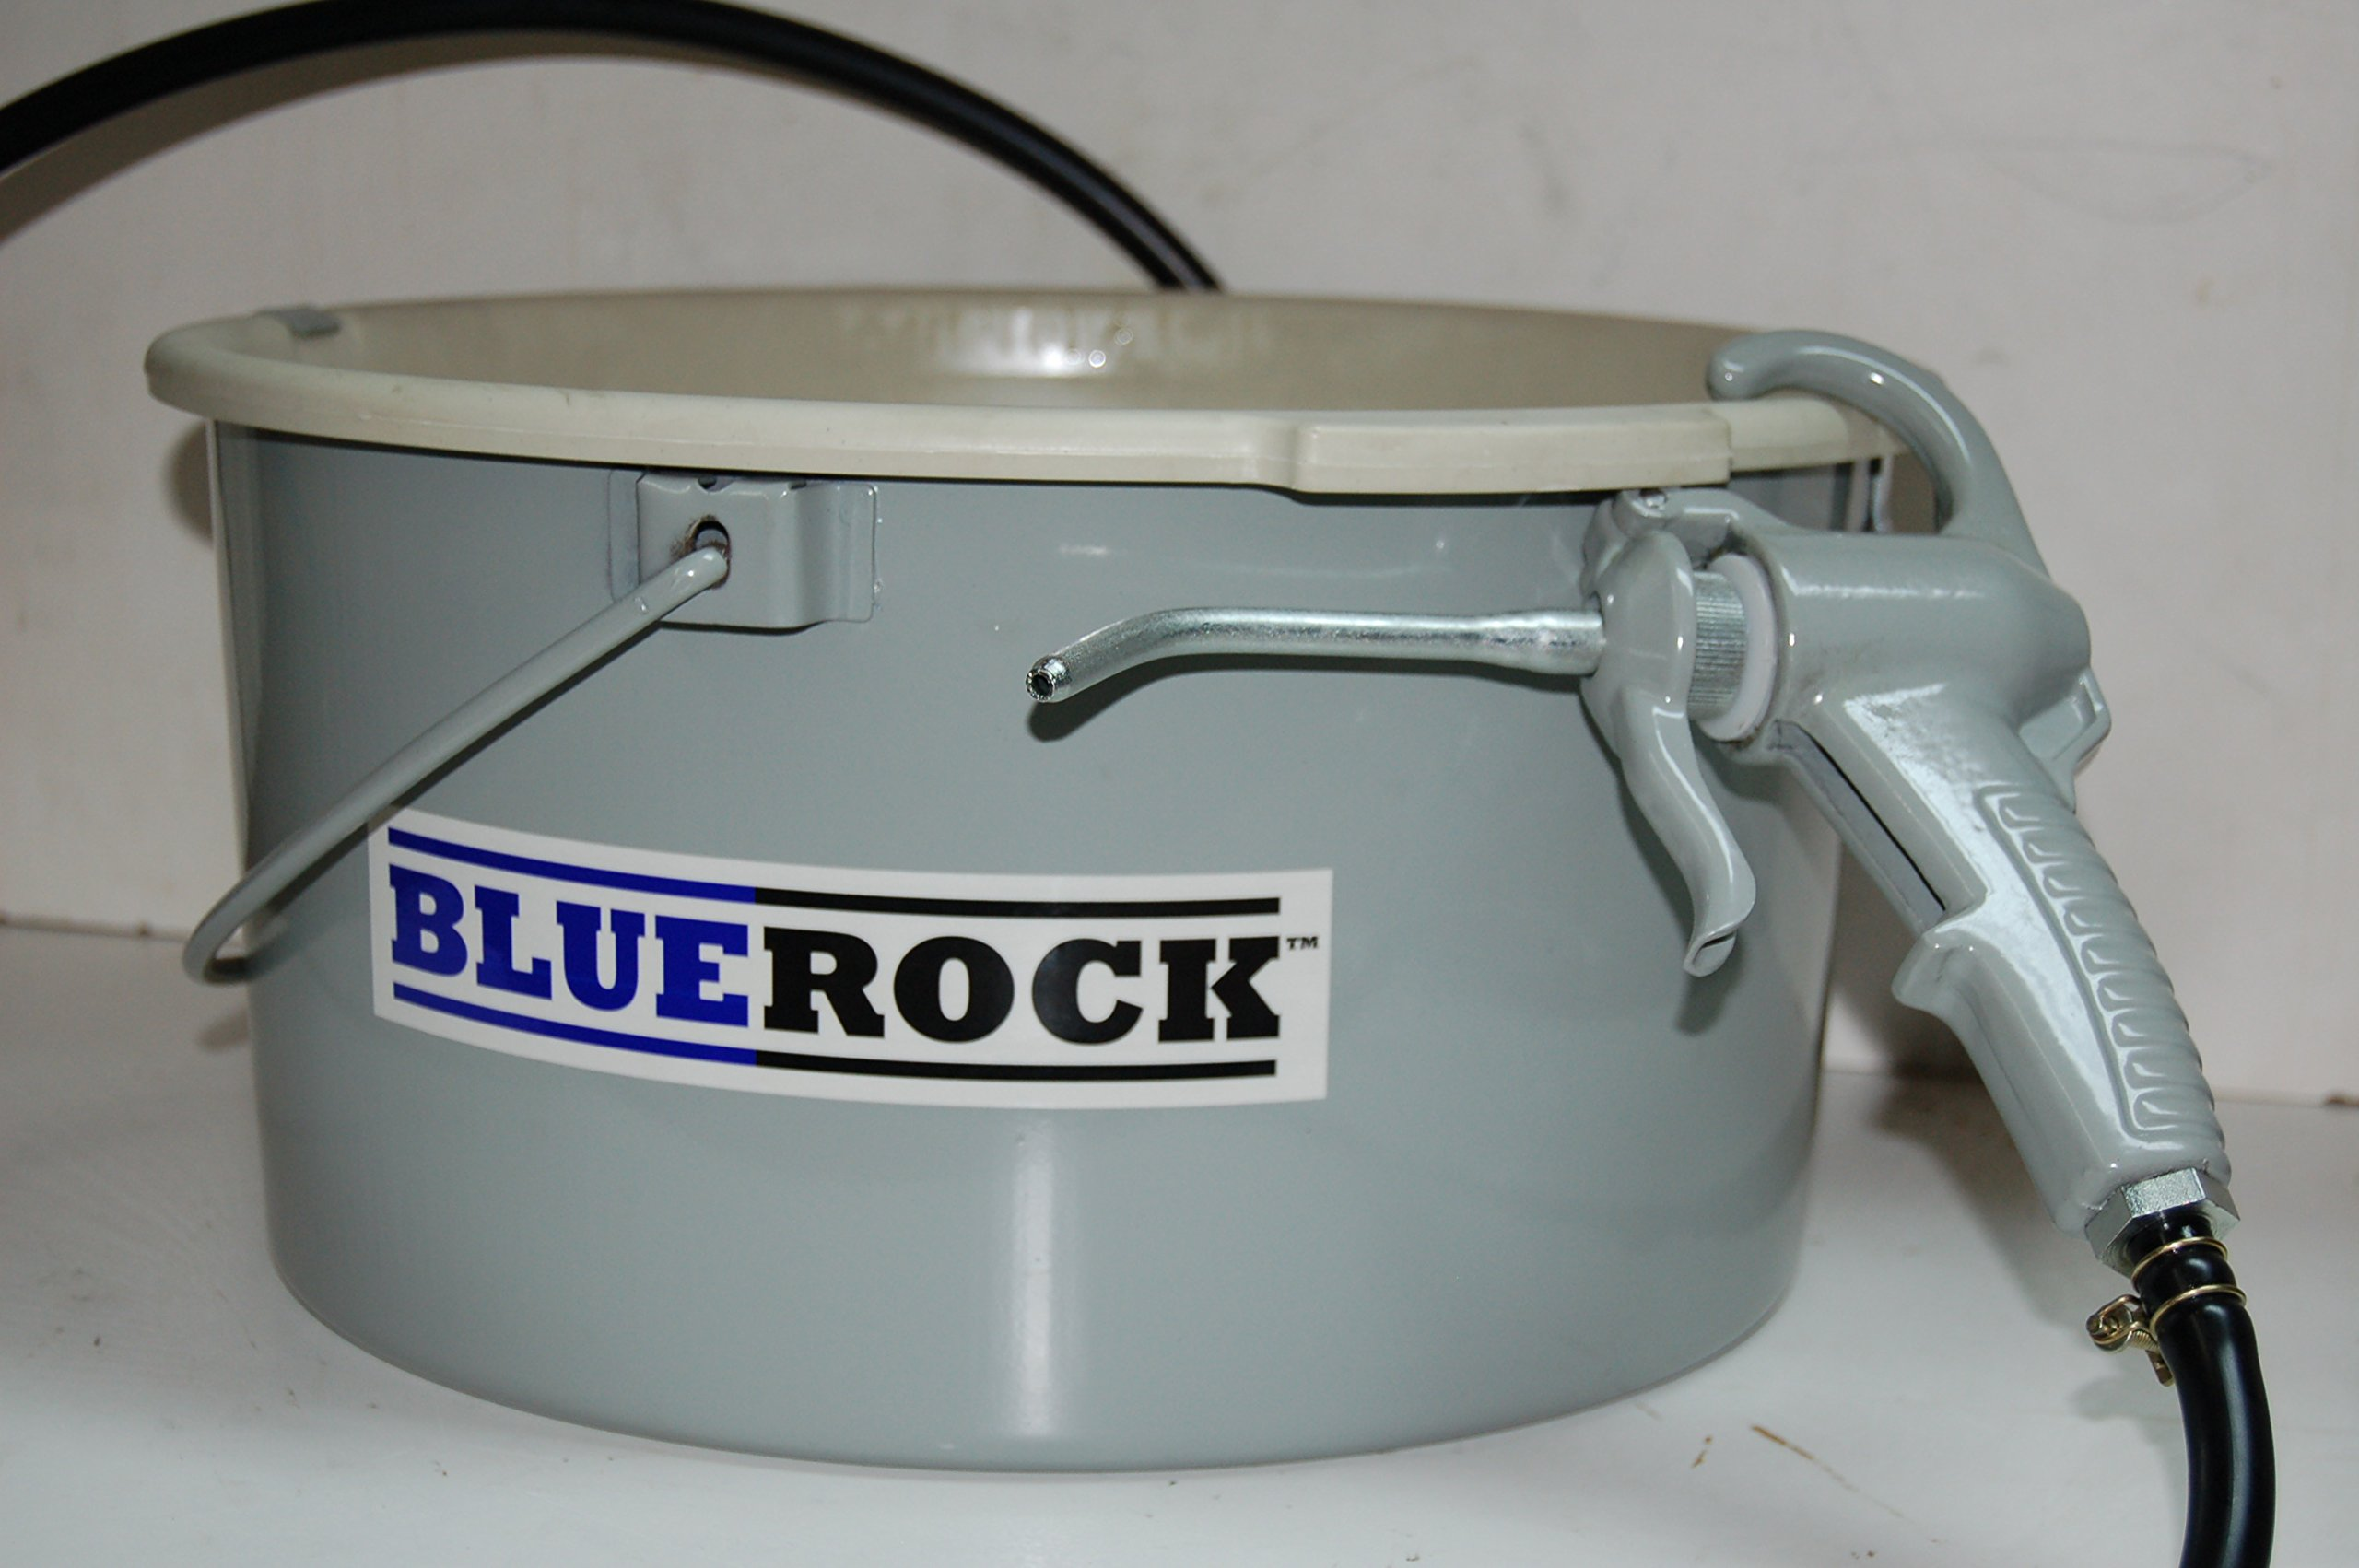 BLUEROCK Tools Hand Held Oiler Bucket for Pipe Threading fits Ridgid 418 300